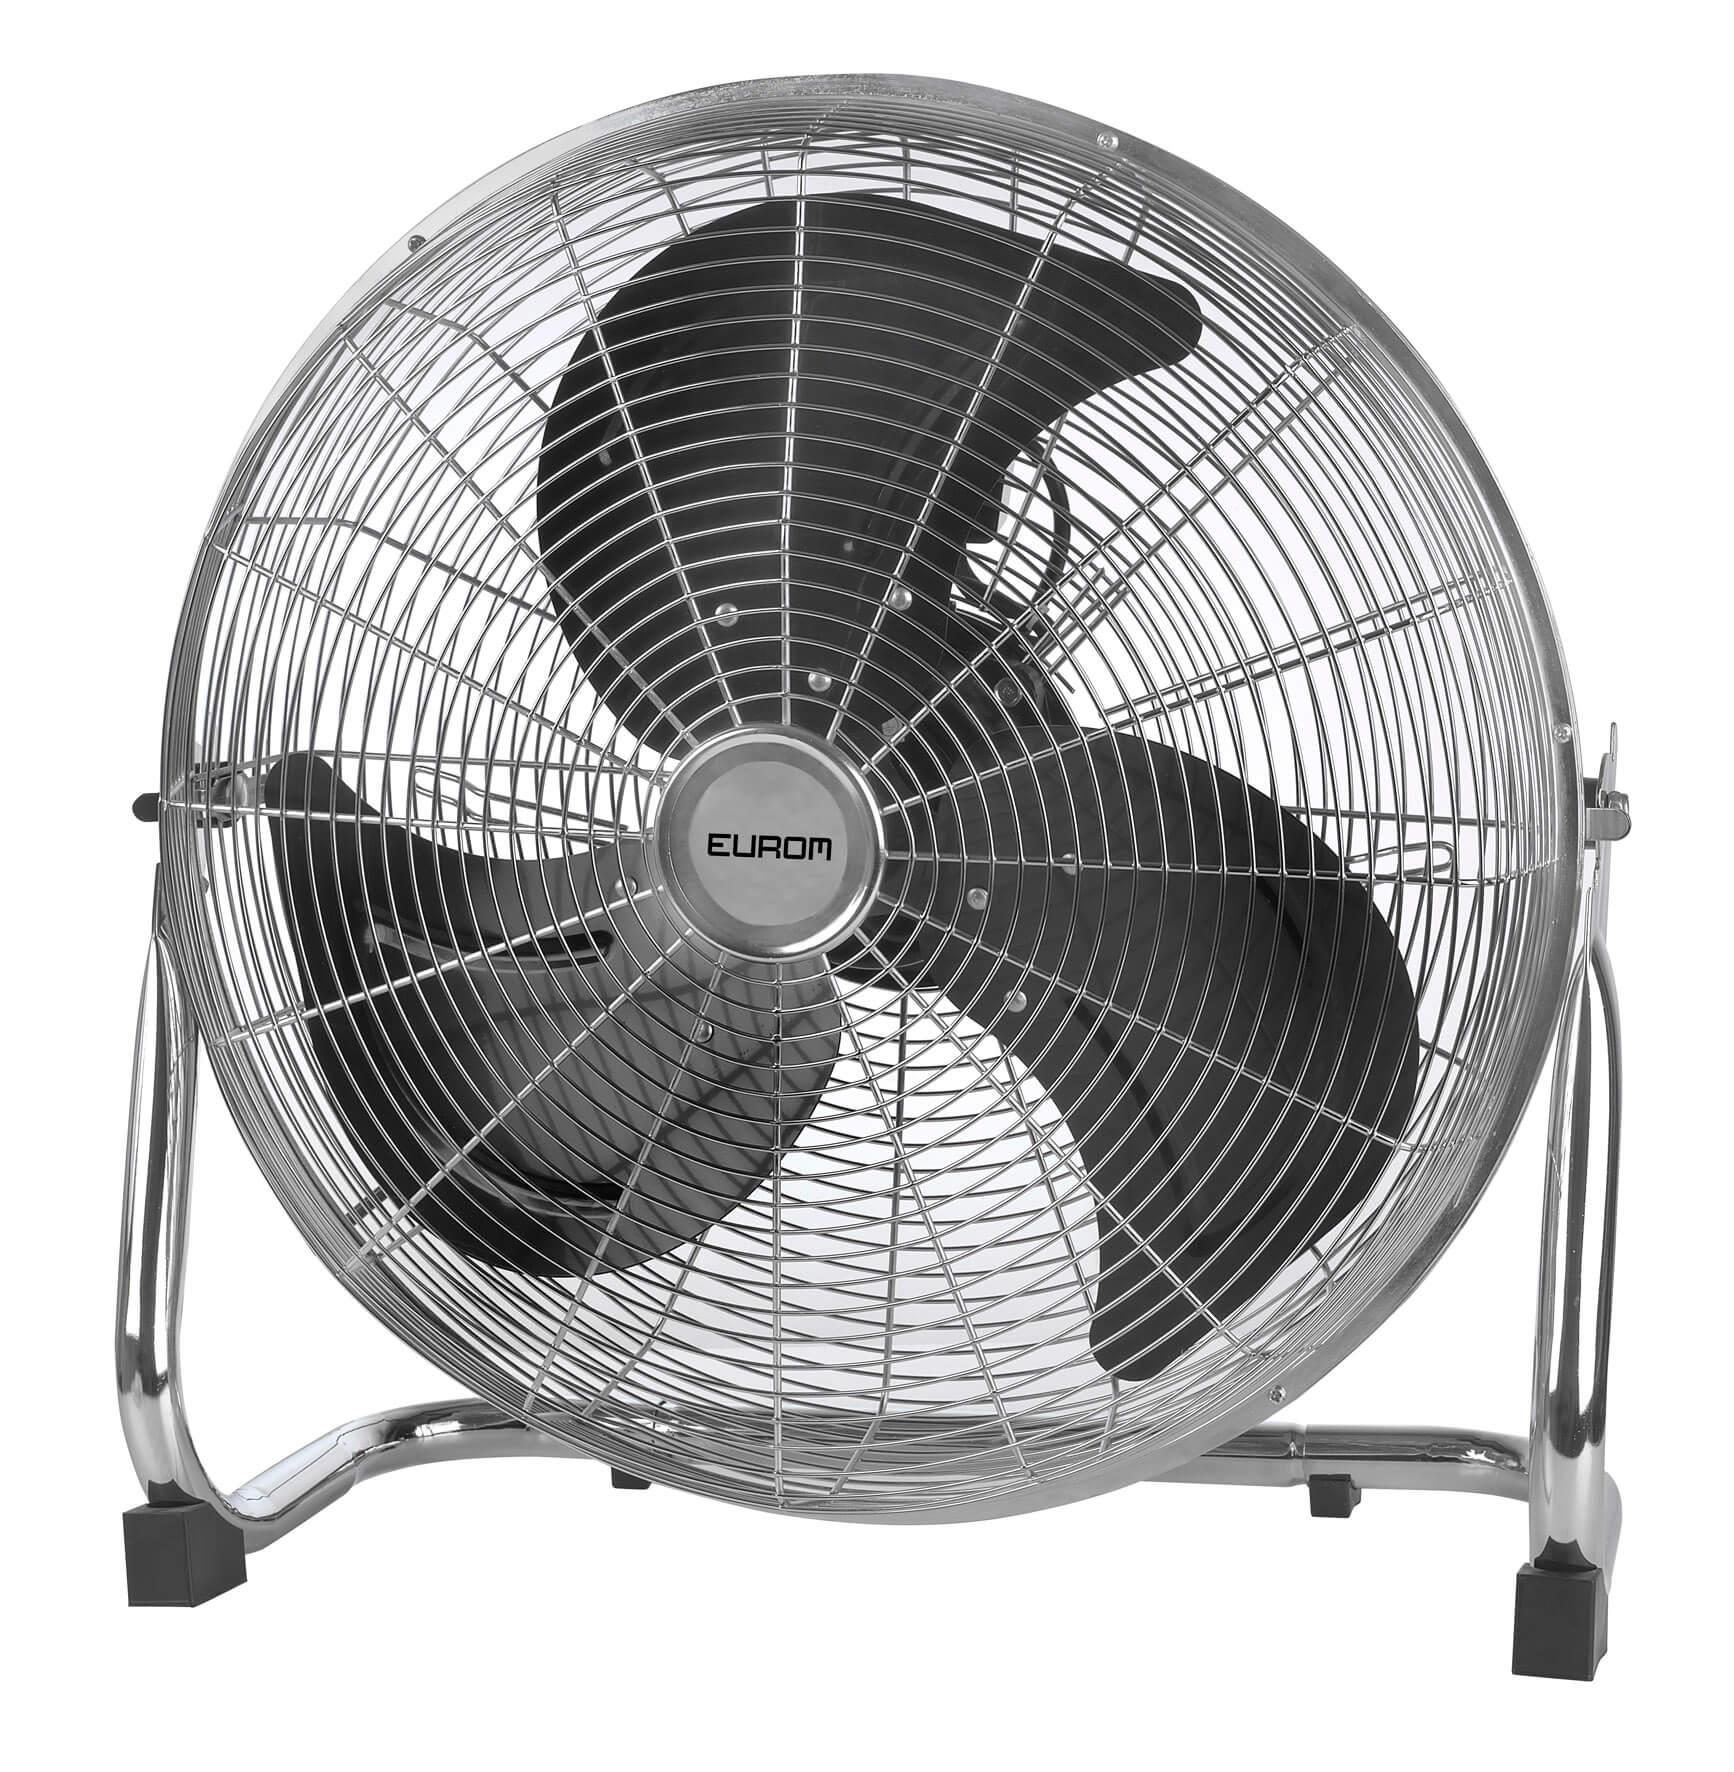 Eurom HVF18-2 professionele ventilator 46 cm vloermodel